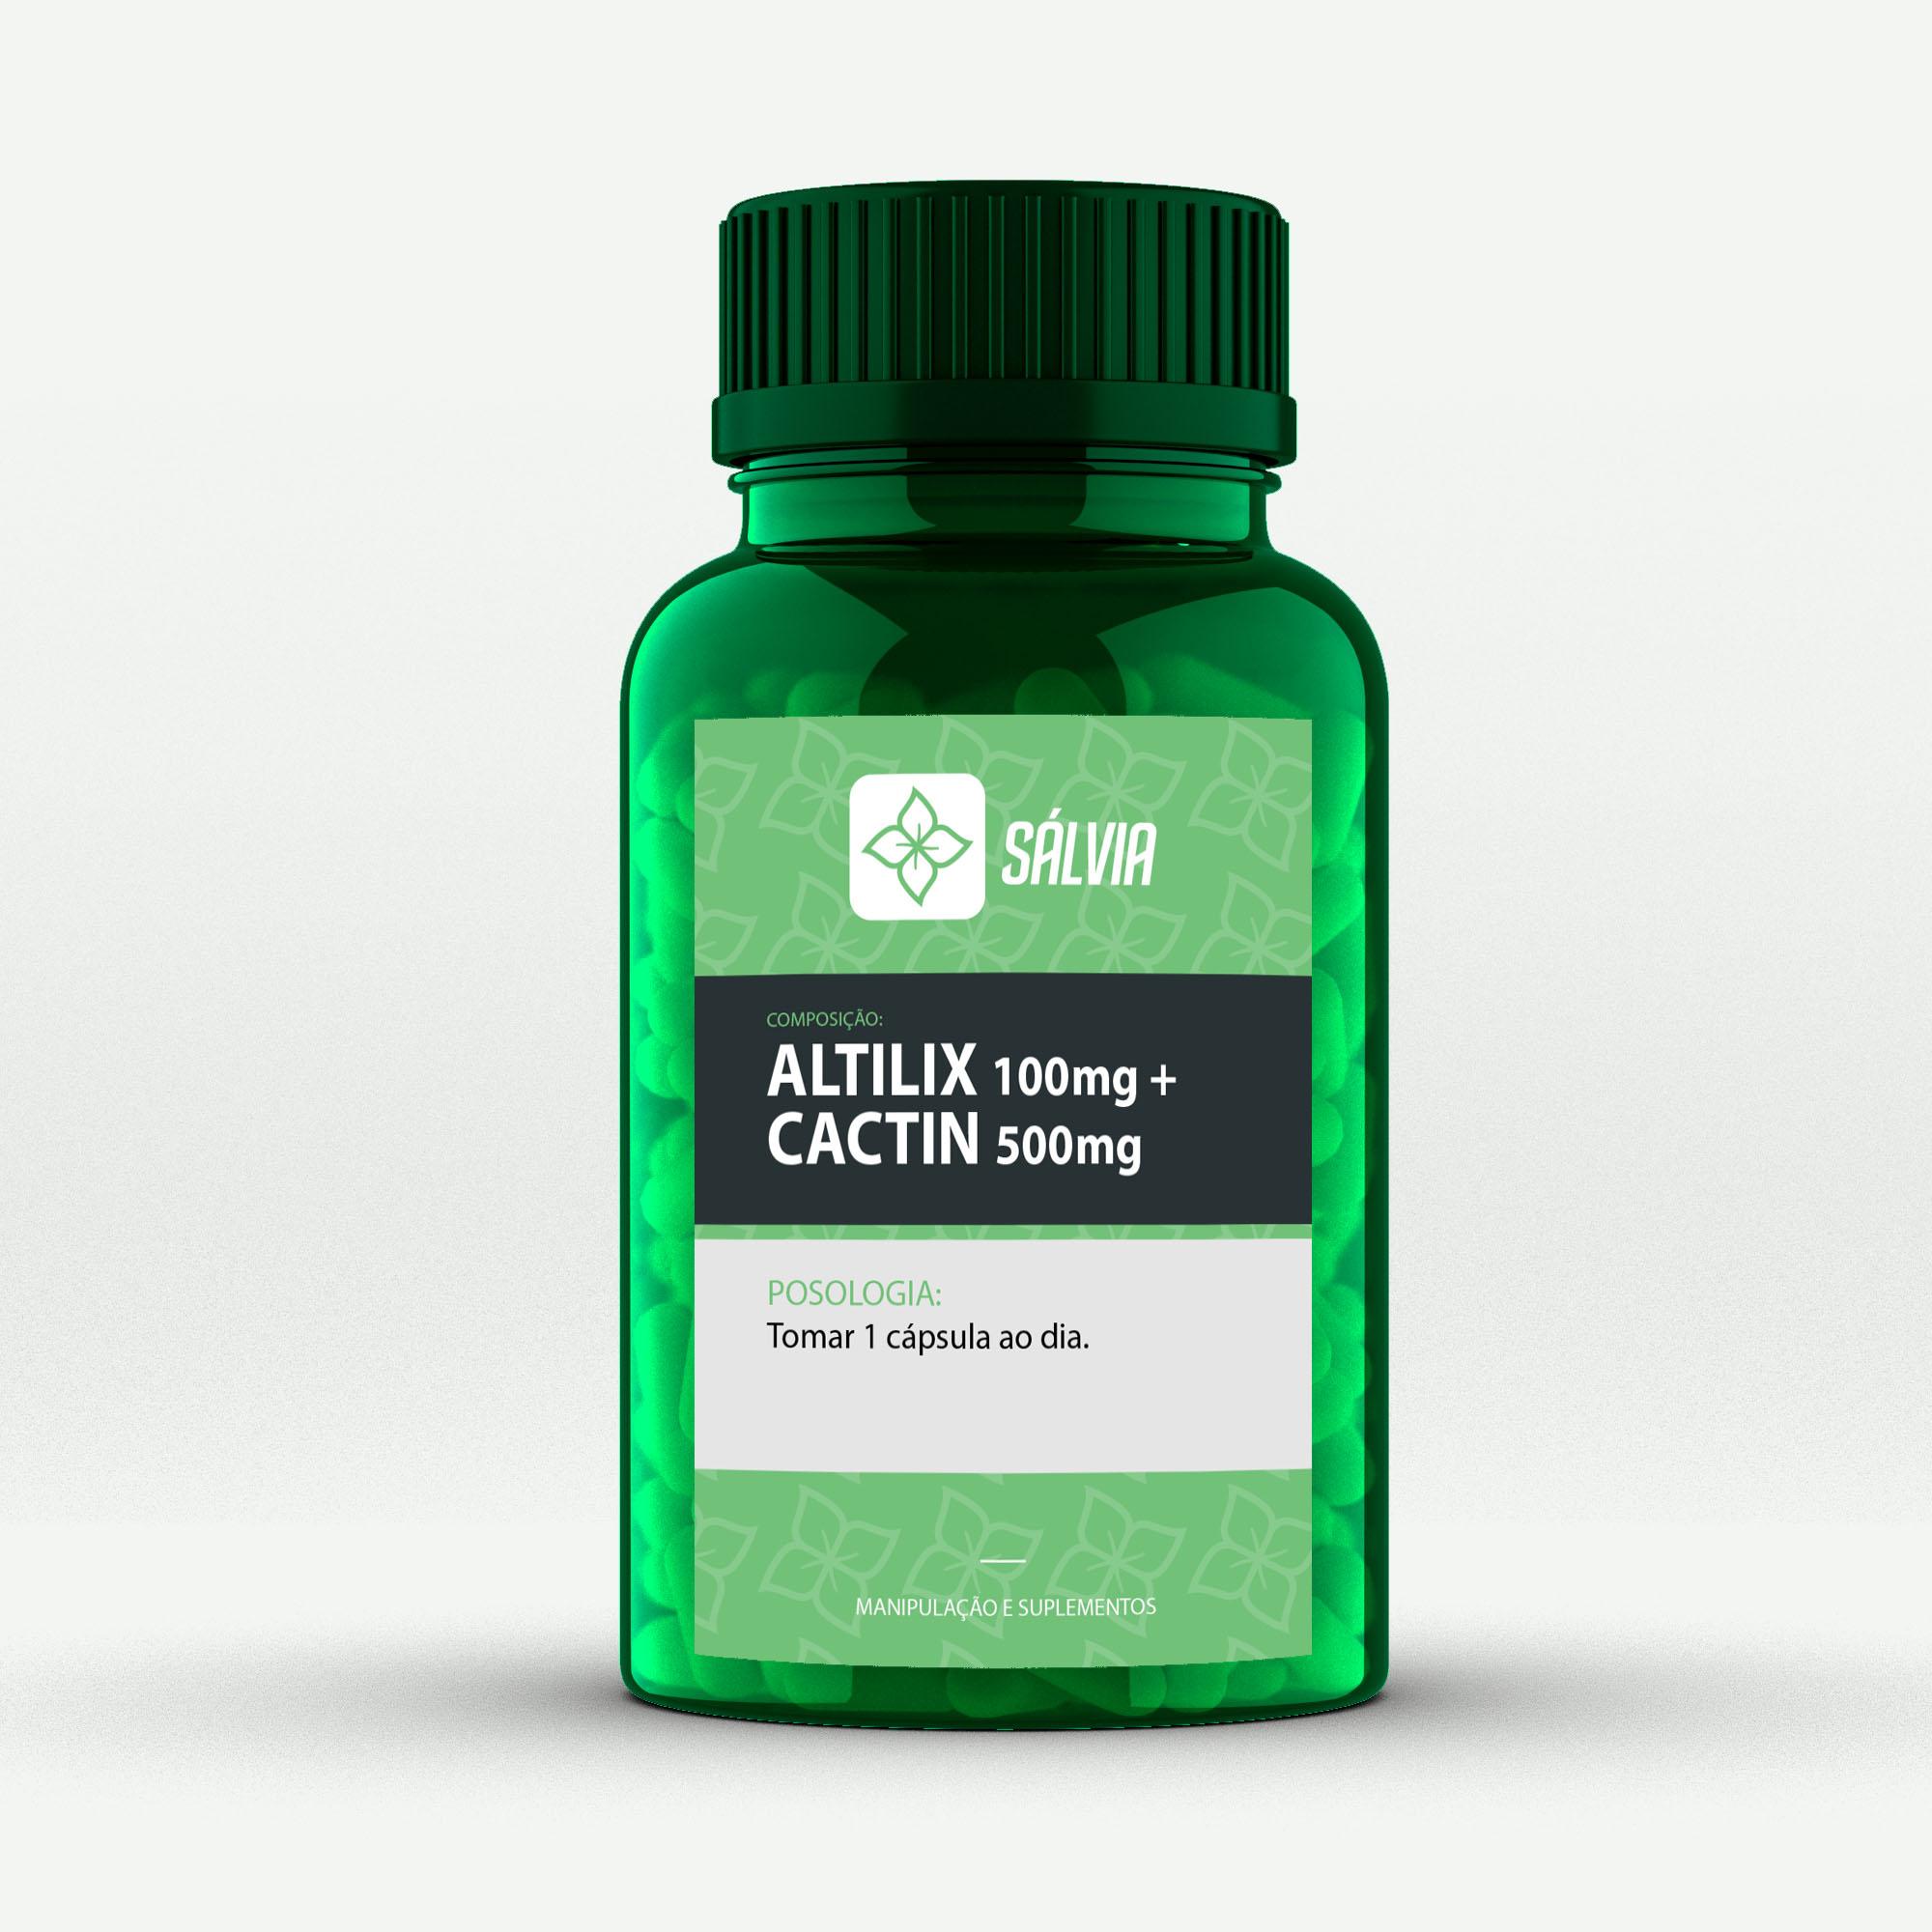 ALTILIX 100mg + CACTIN 500mg - Cápsulas